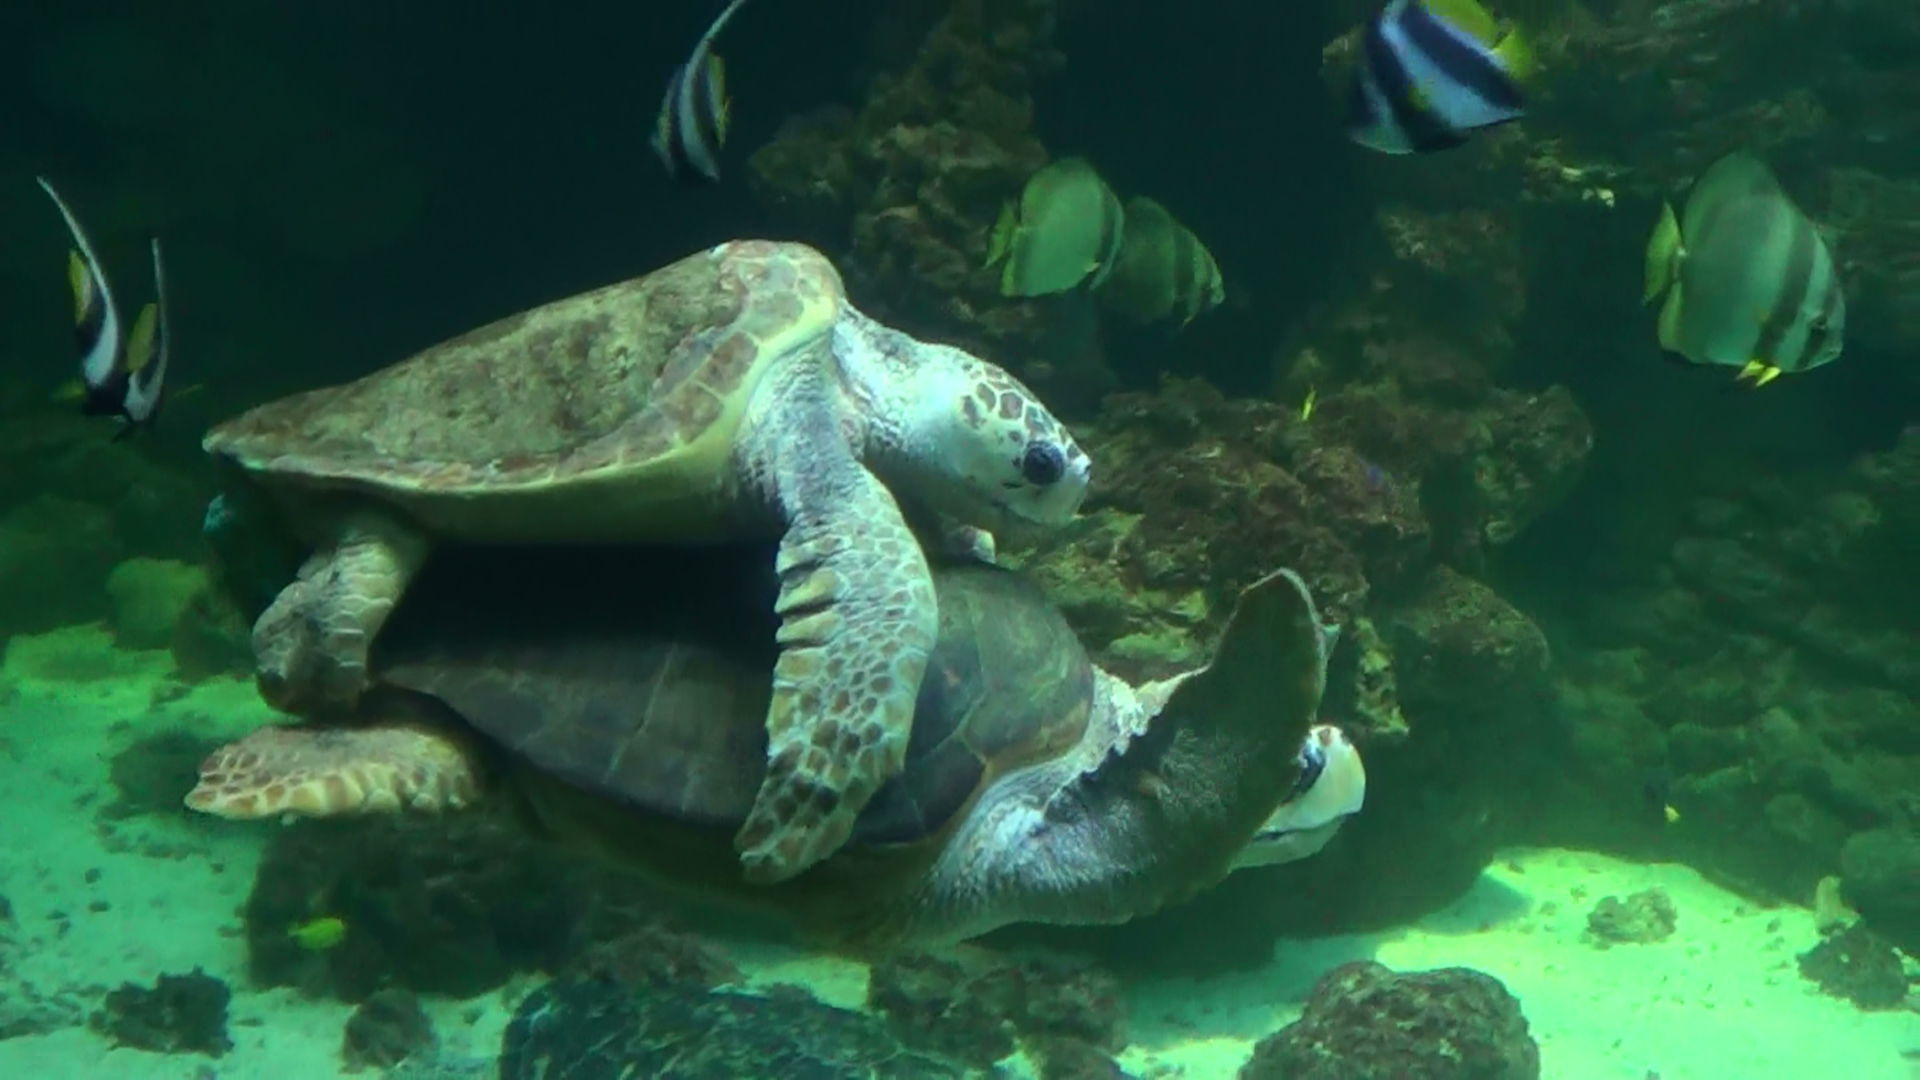 Mating loggerhead sea turtles (Caretta caretta) - no. 2